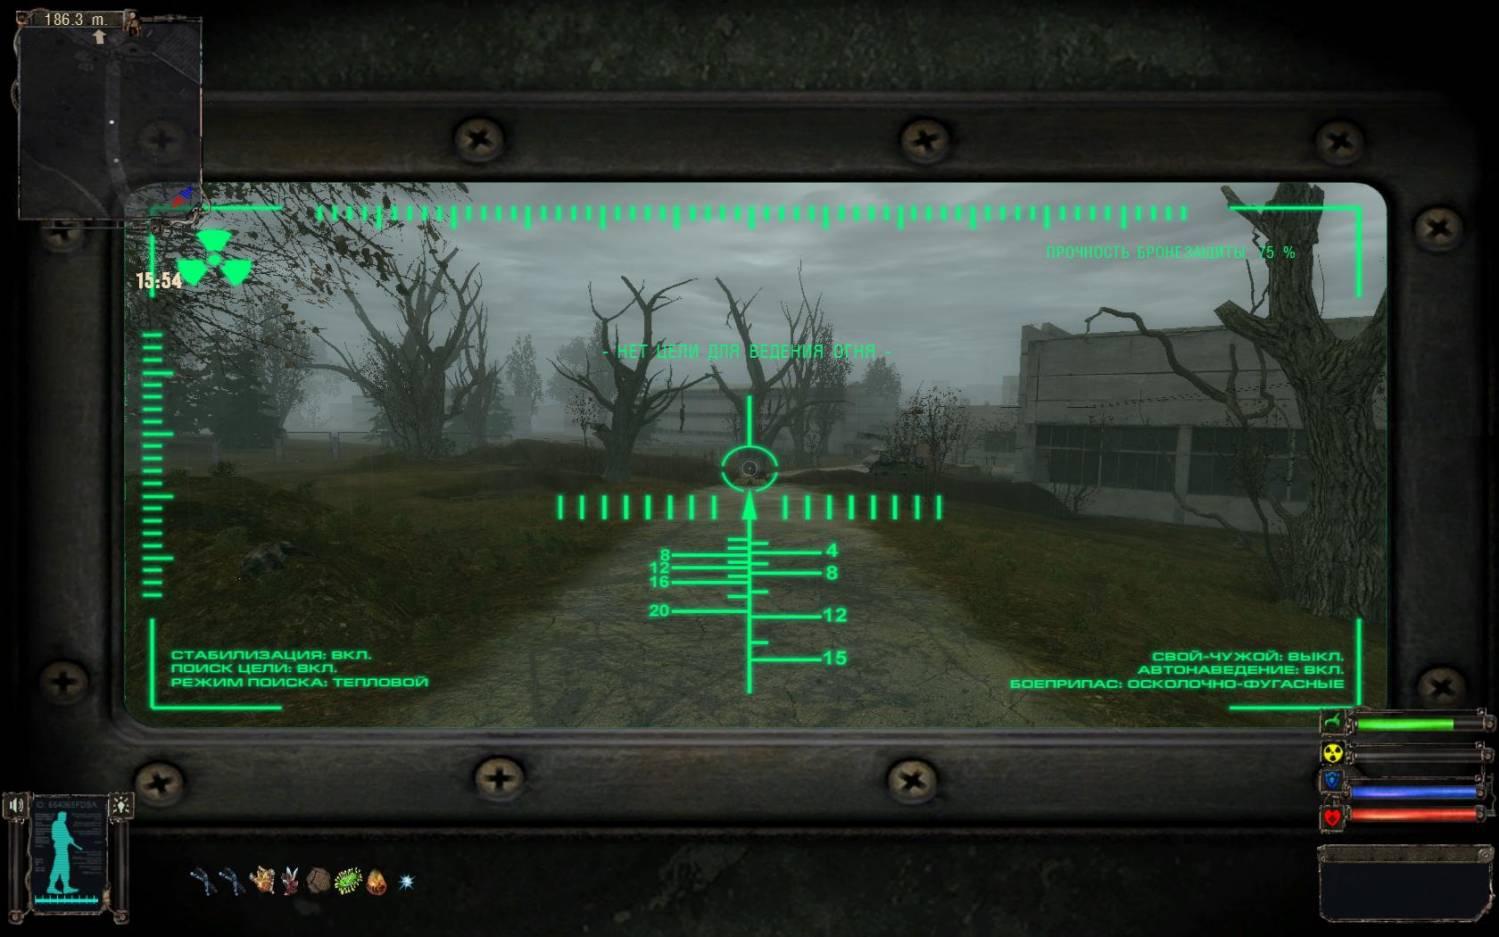 S. T. A. L. K. E. R. Ogse 0. 6. 9. 3 скачать торрент.